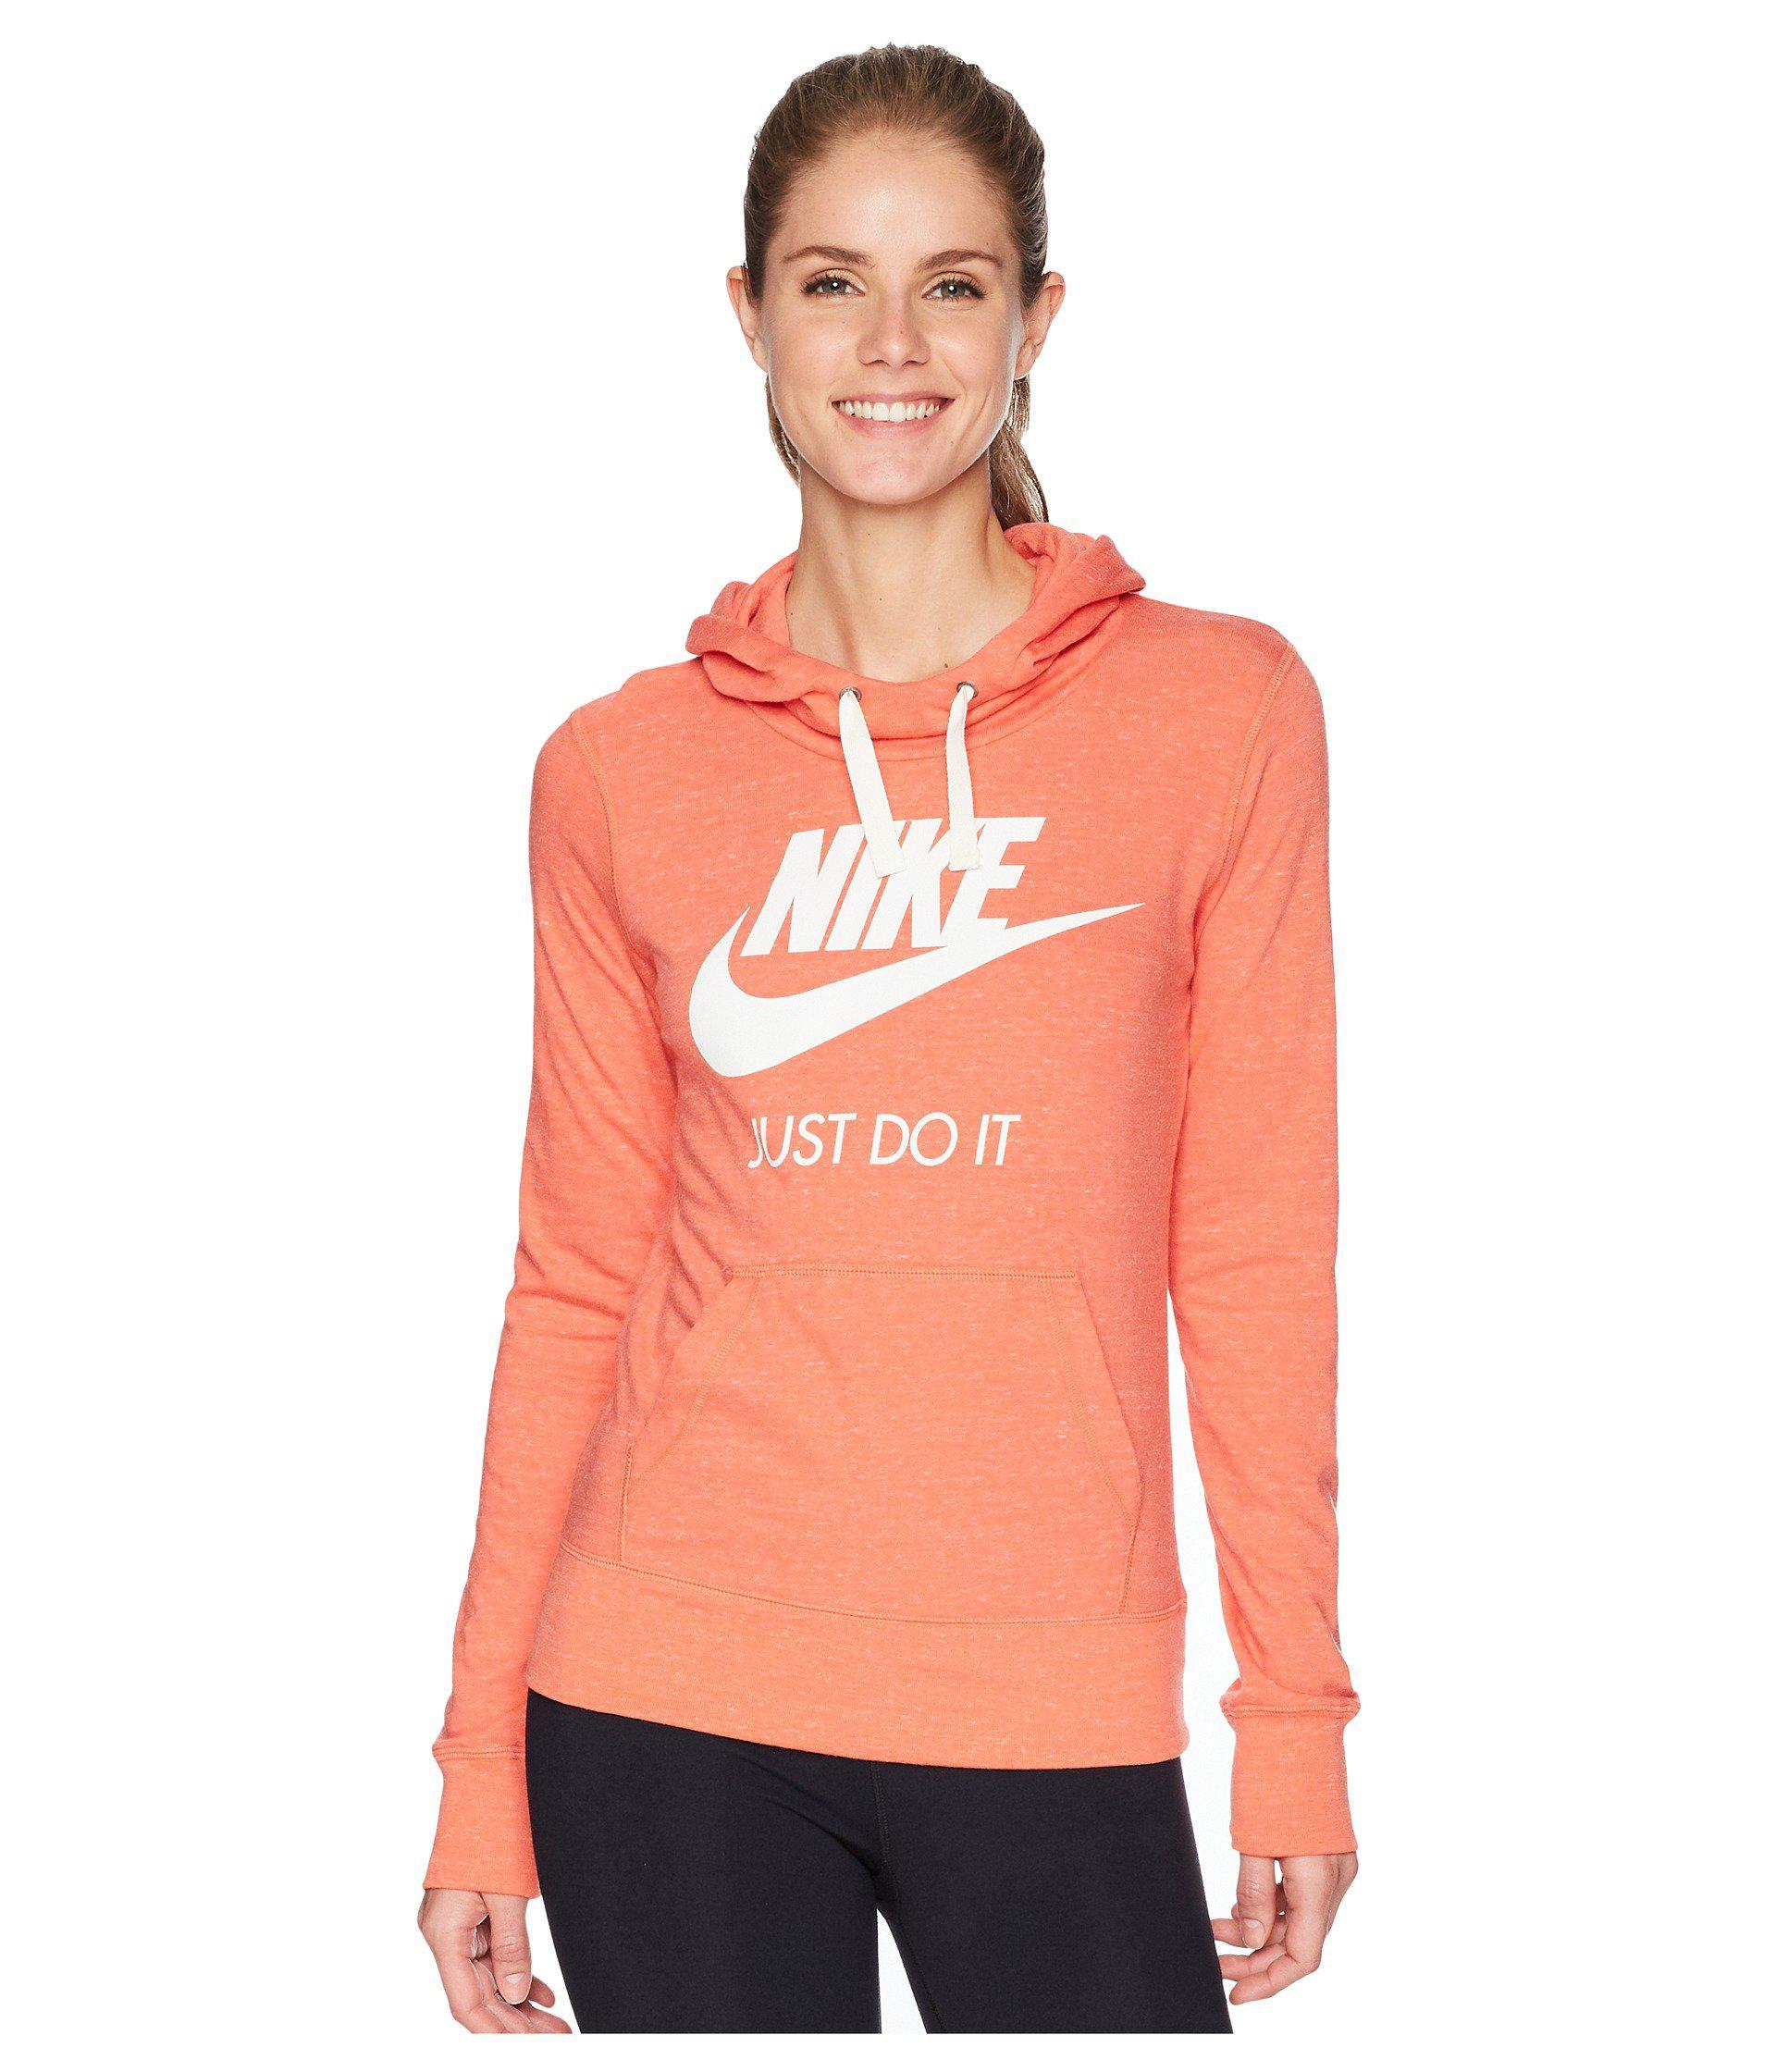 90f66cb30 Lyst - Nike Sportswear Gym Vintage Hbr Hoodie (birch Heather/sail ...